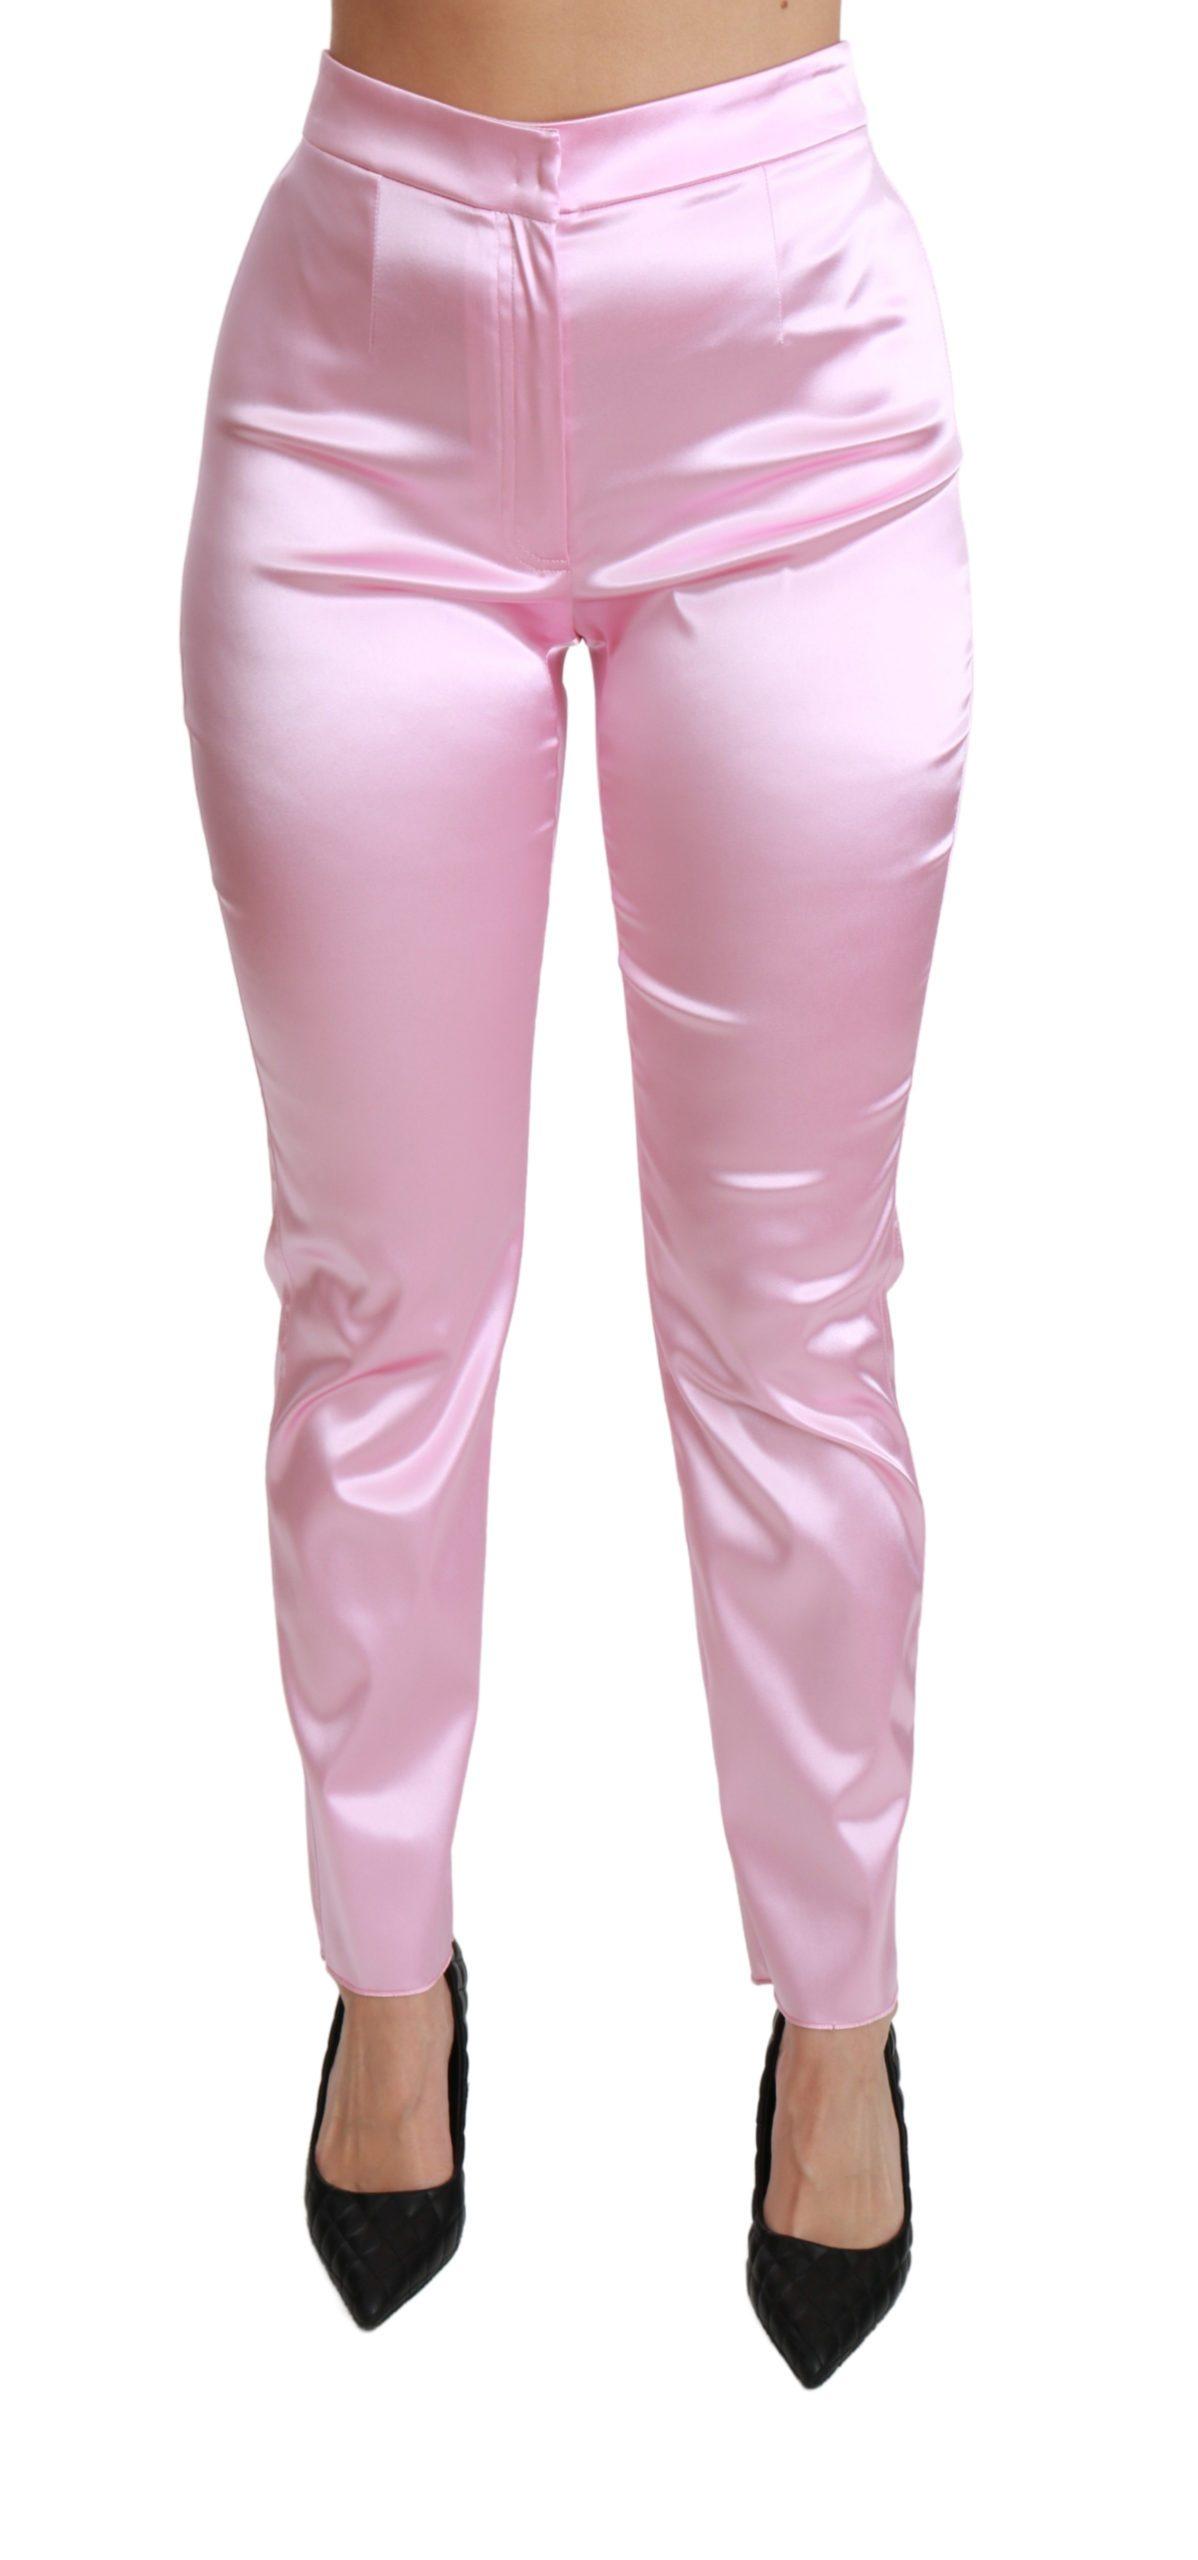 Dolce & Gabbana Women's Metallic High Waist Skinny Trouser Pink PAN70816 - IT44 L